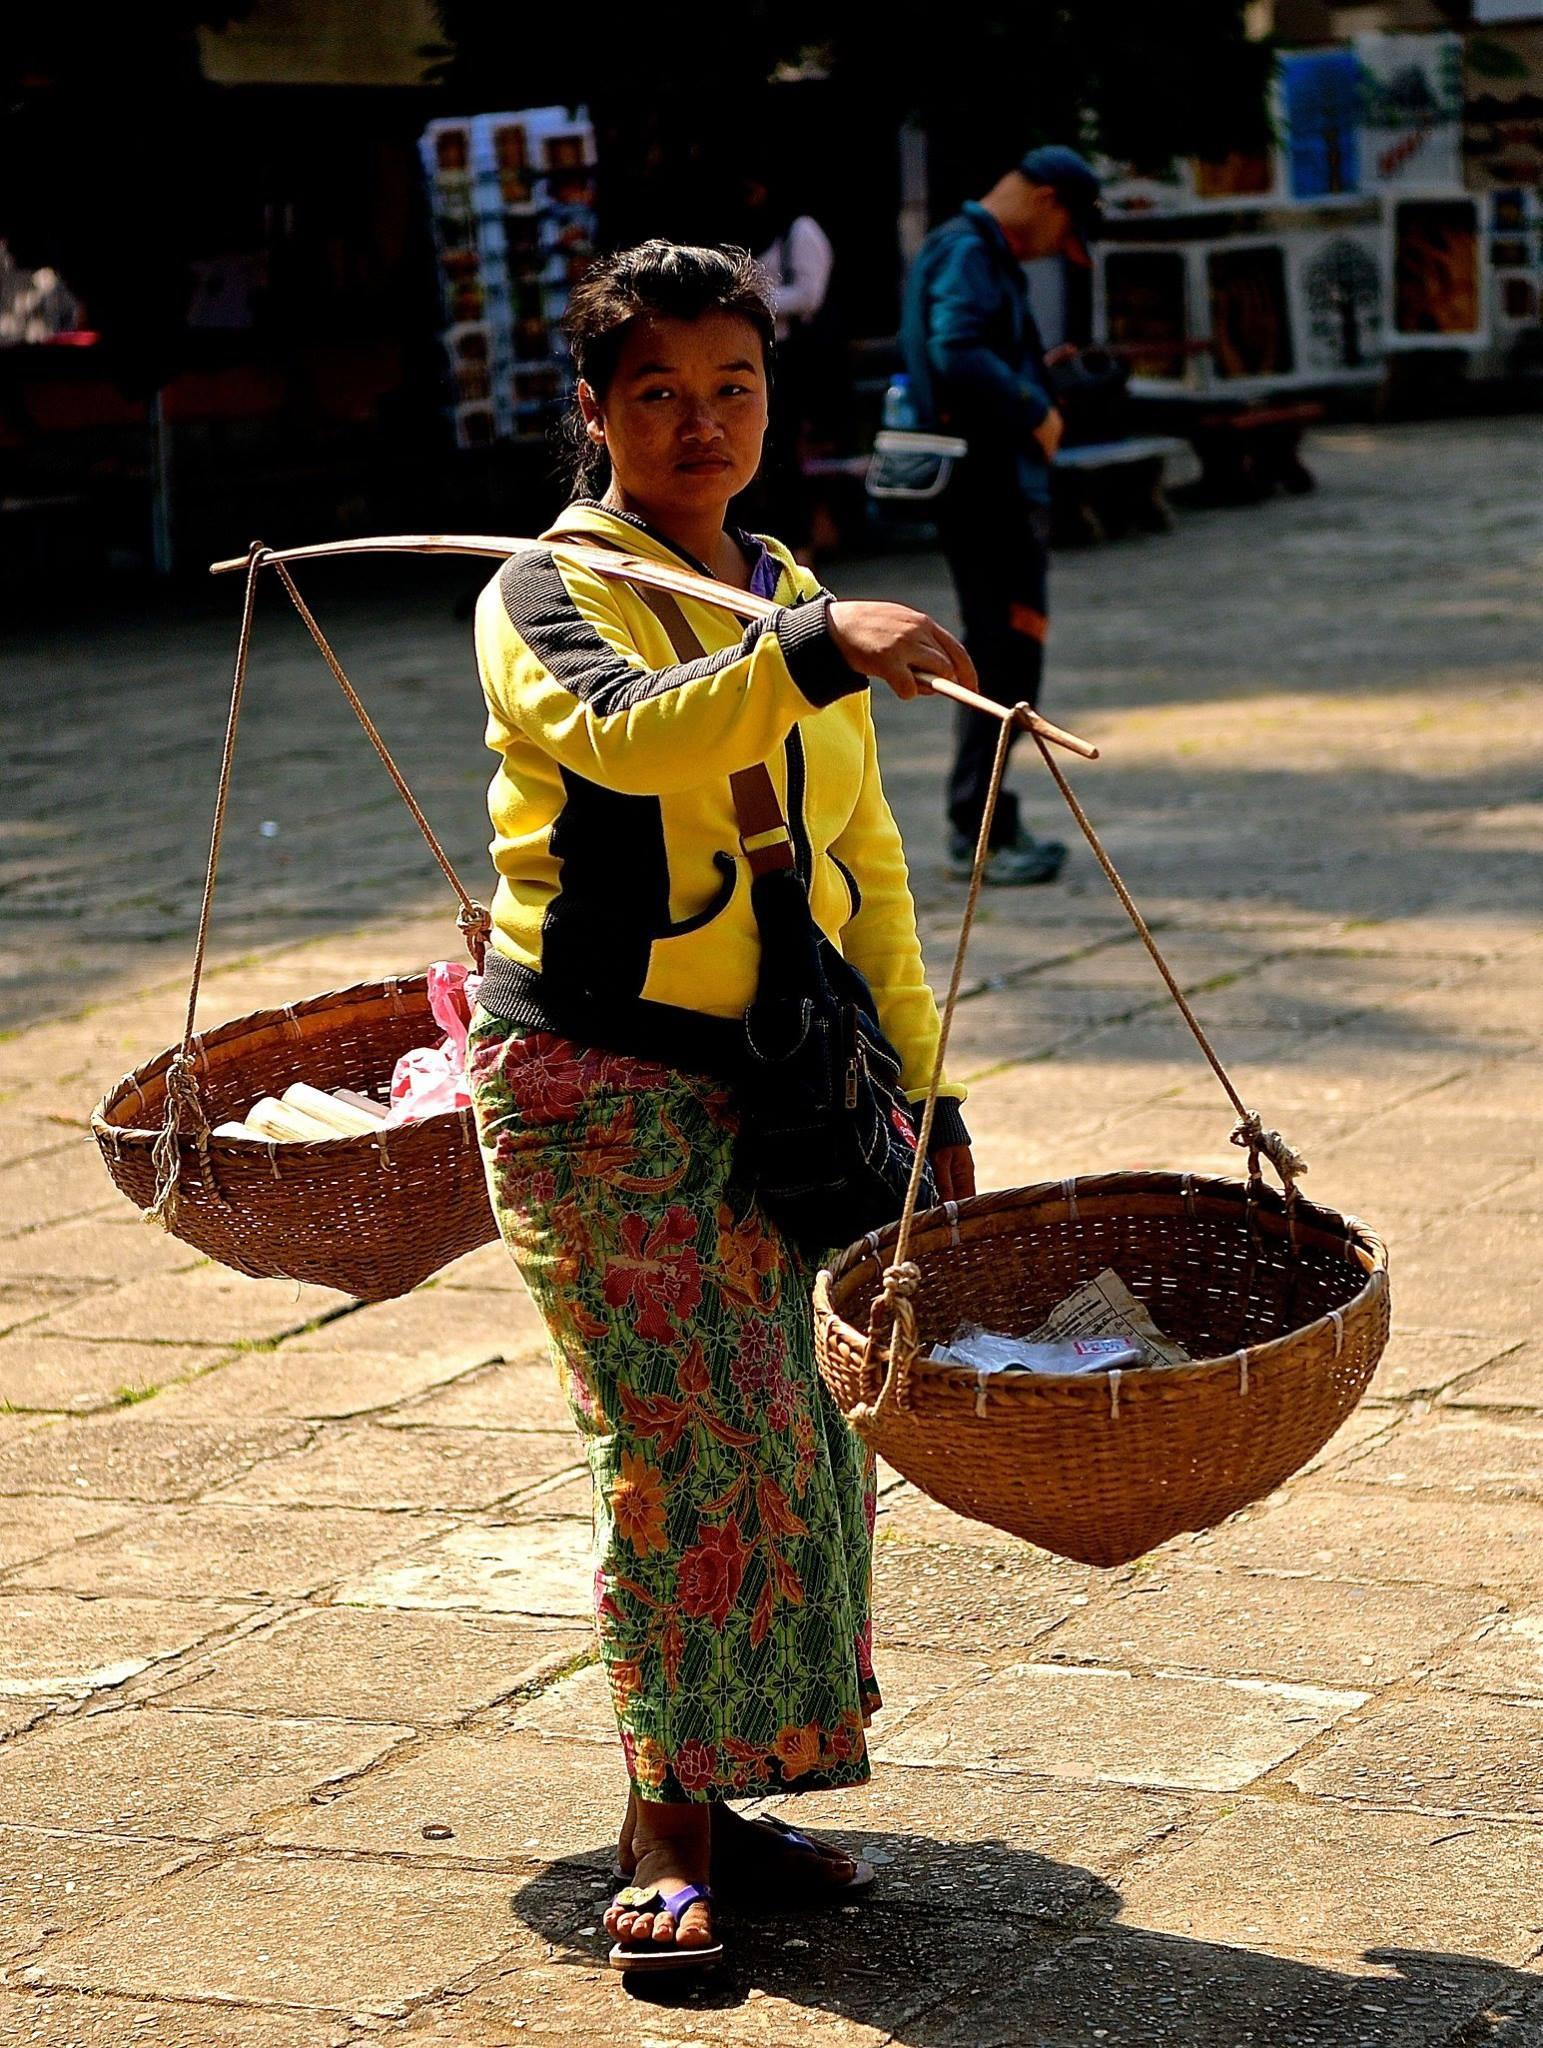 Cambodia 2017 by Robert Malin Young